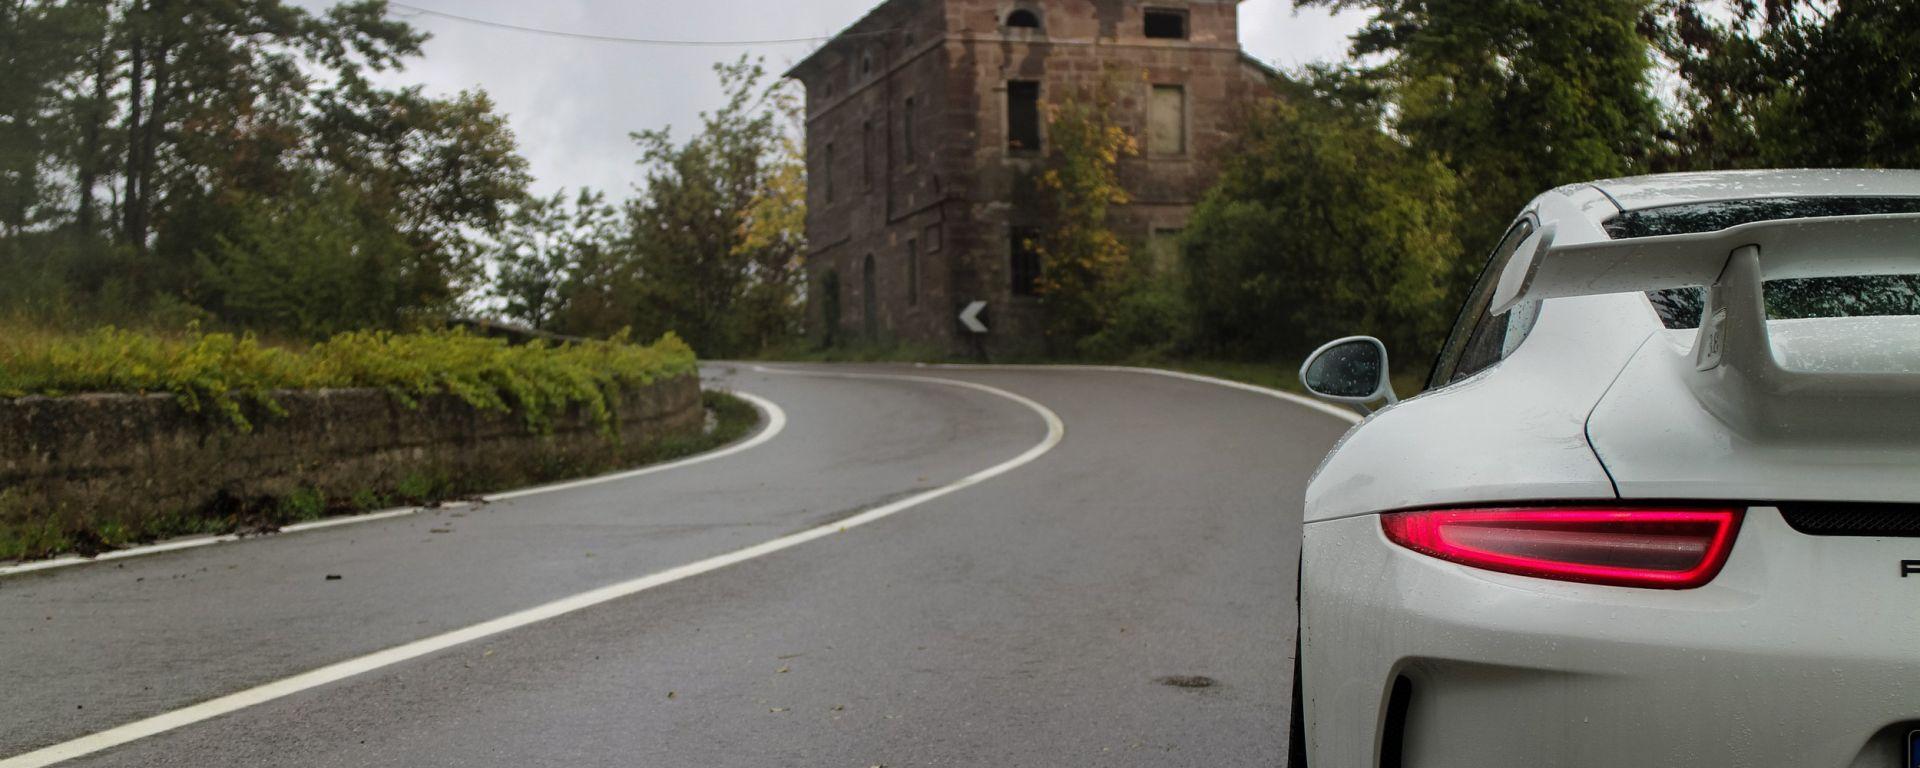 Weareontheroad Passo Della Cisa Motorbox